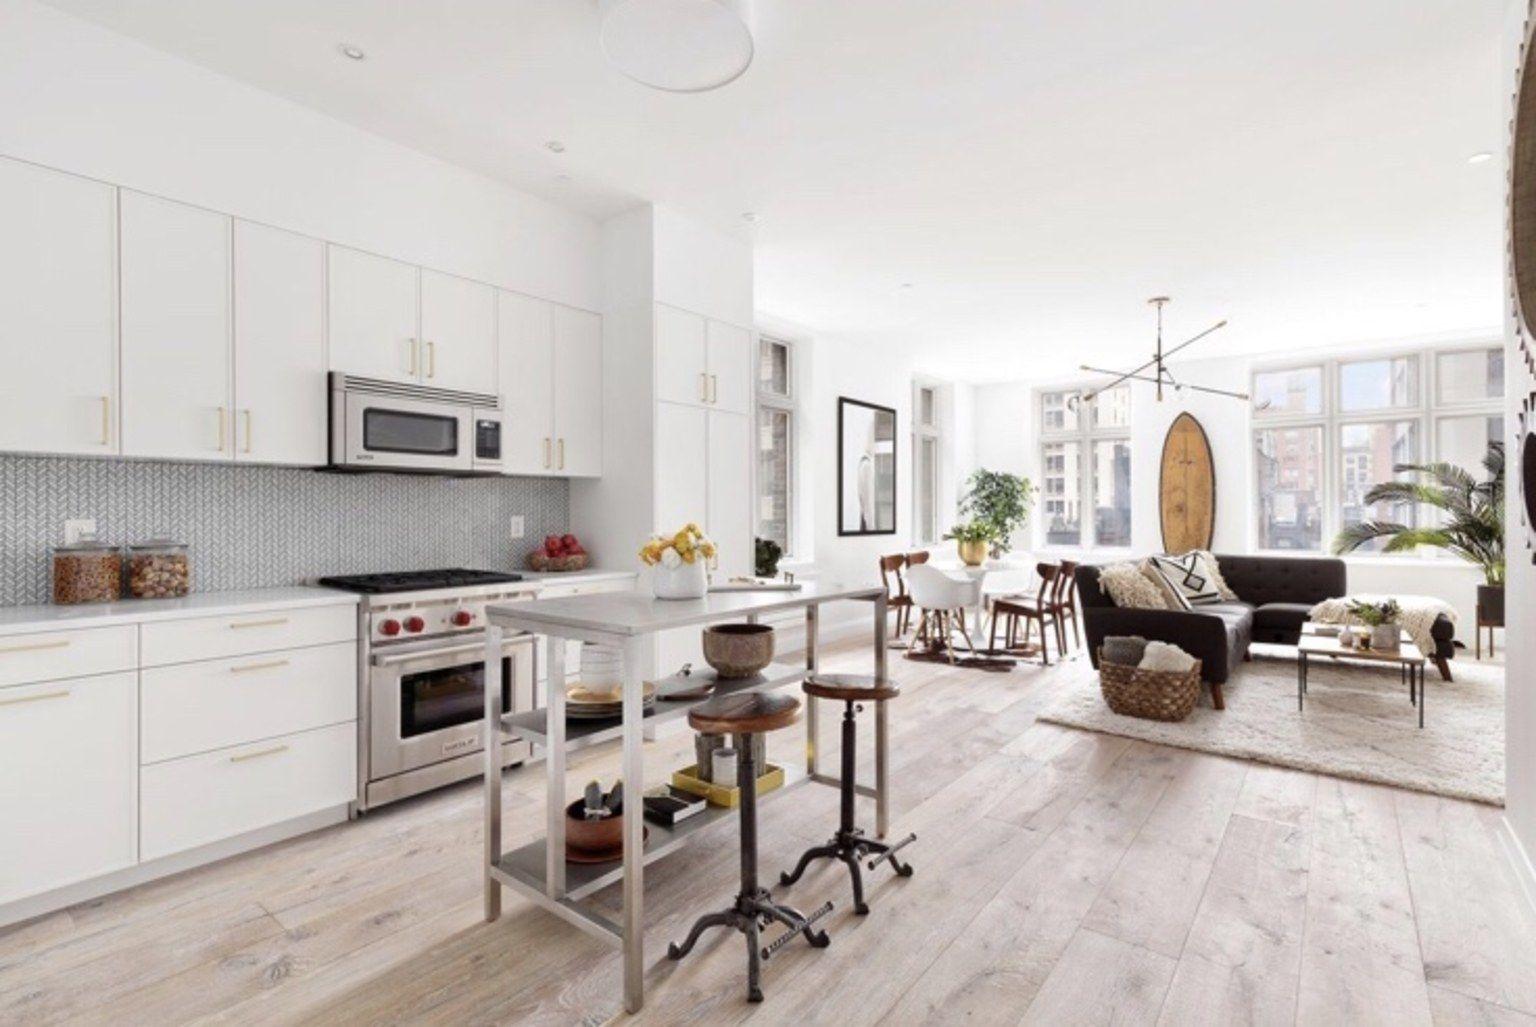 Ira Glass S Completely Renovated New York City Condo Is On The Market For 1 75 Million Home Decor Kitchen Modern Kitchen Design Loft Kitchen